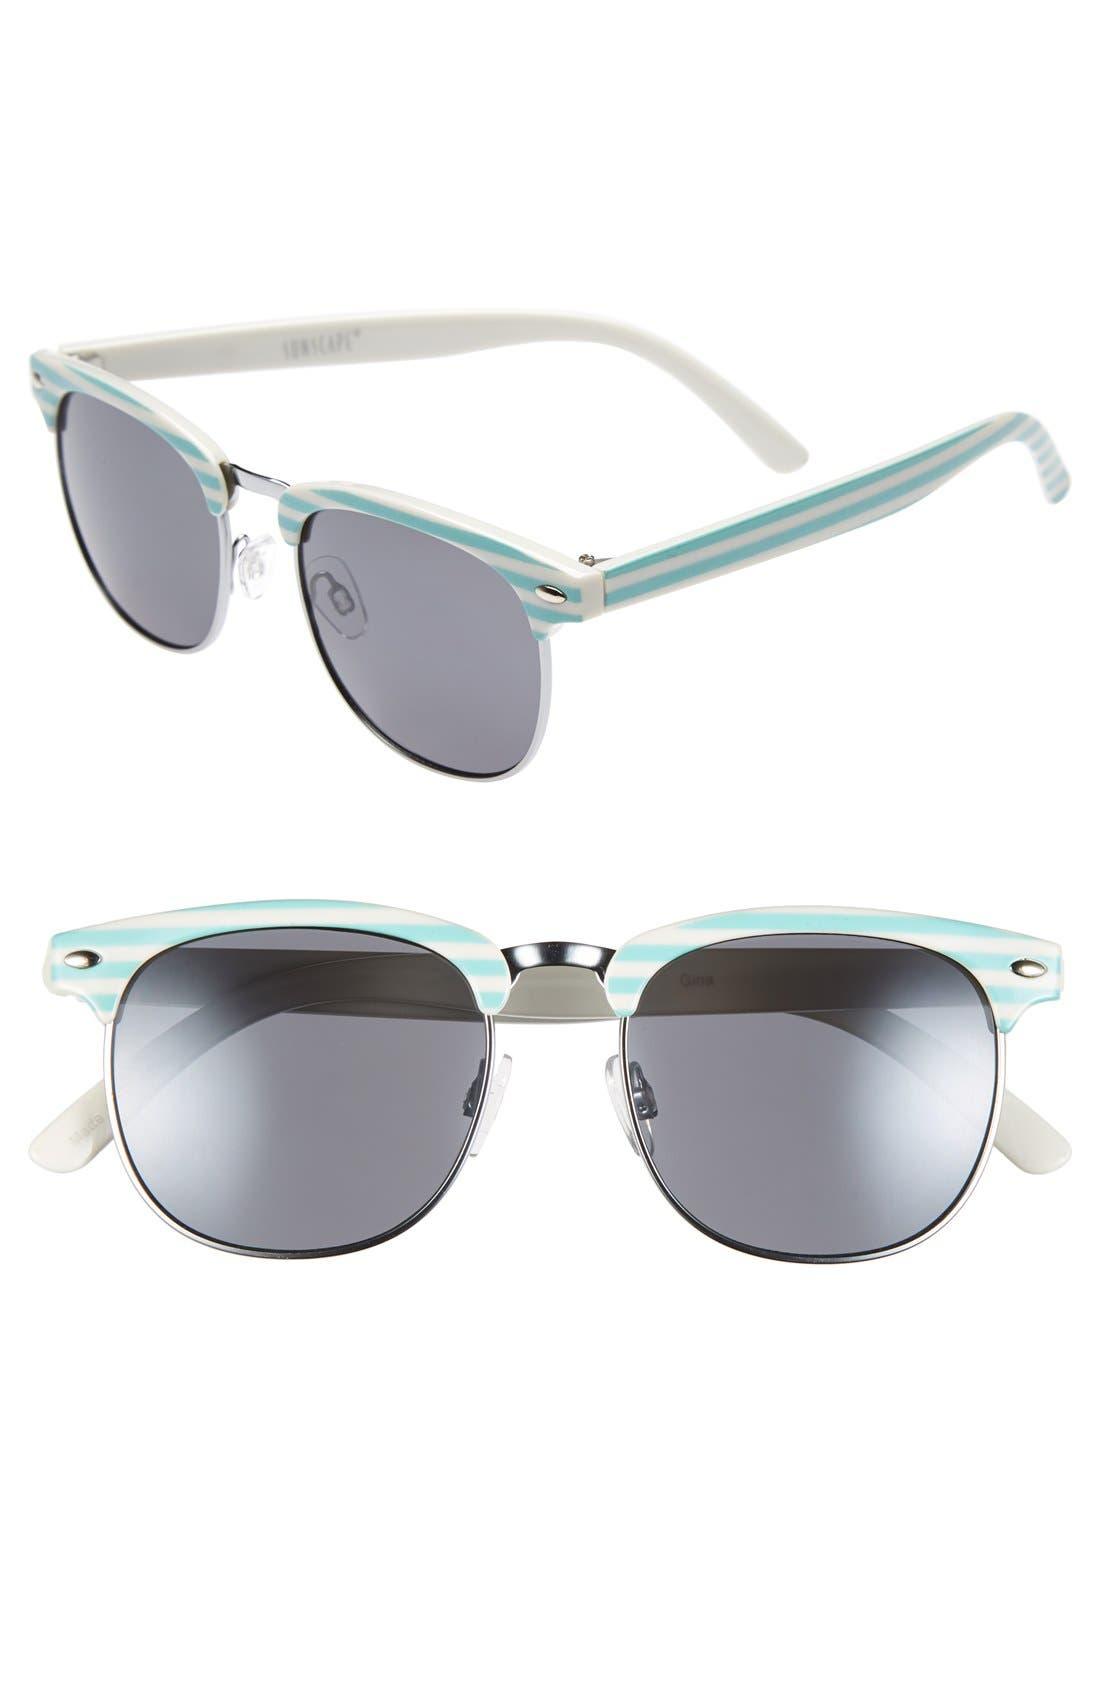 Main Image - BP. 'Club Master' 58mm Sunglasses (Juniors)